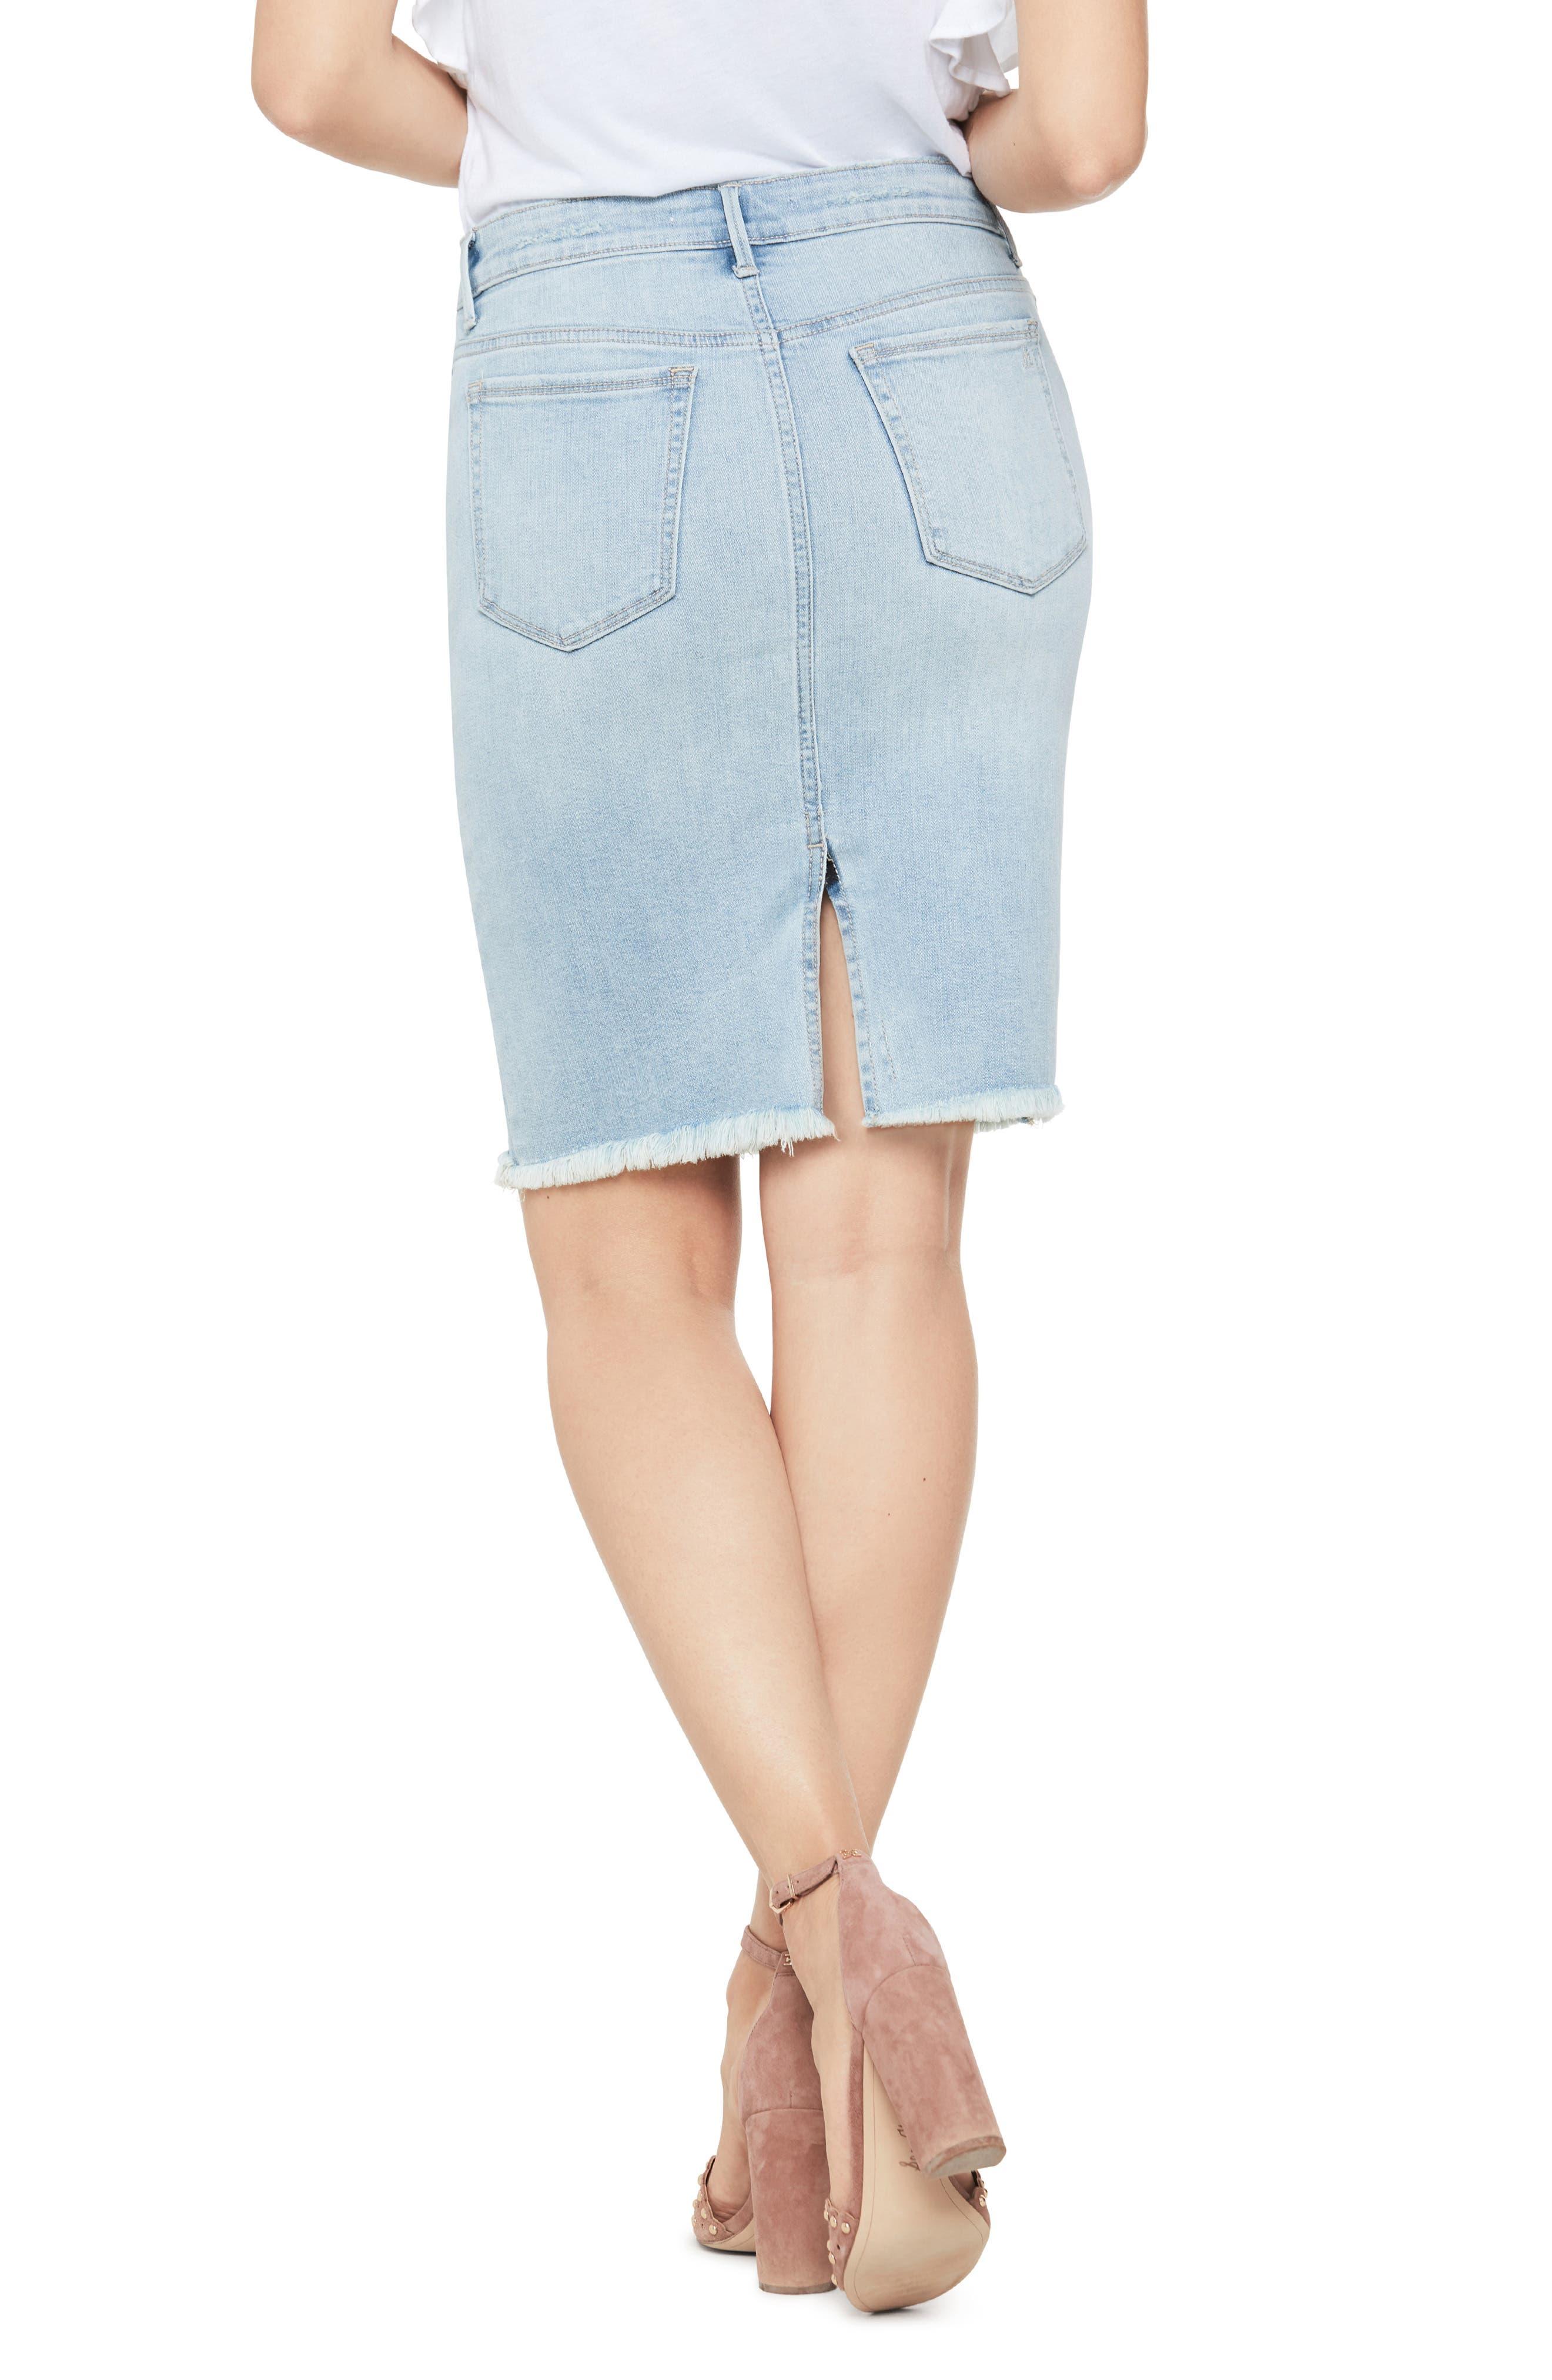 6f01f1cc86ab3 Women's Skirts Jeans & Denim | Nordstrom